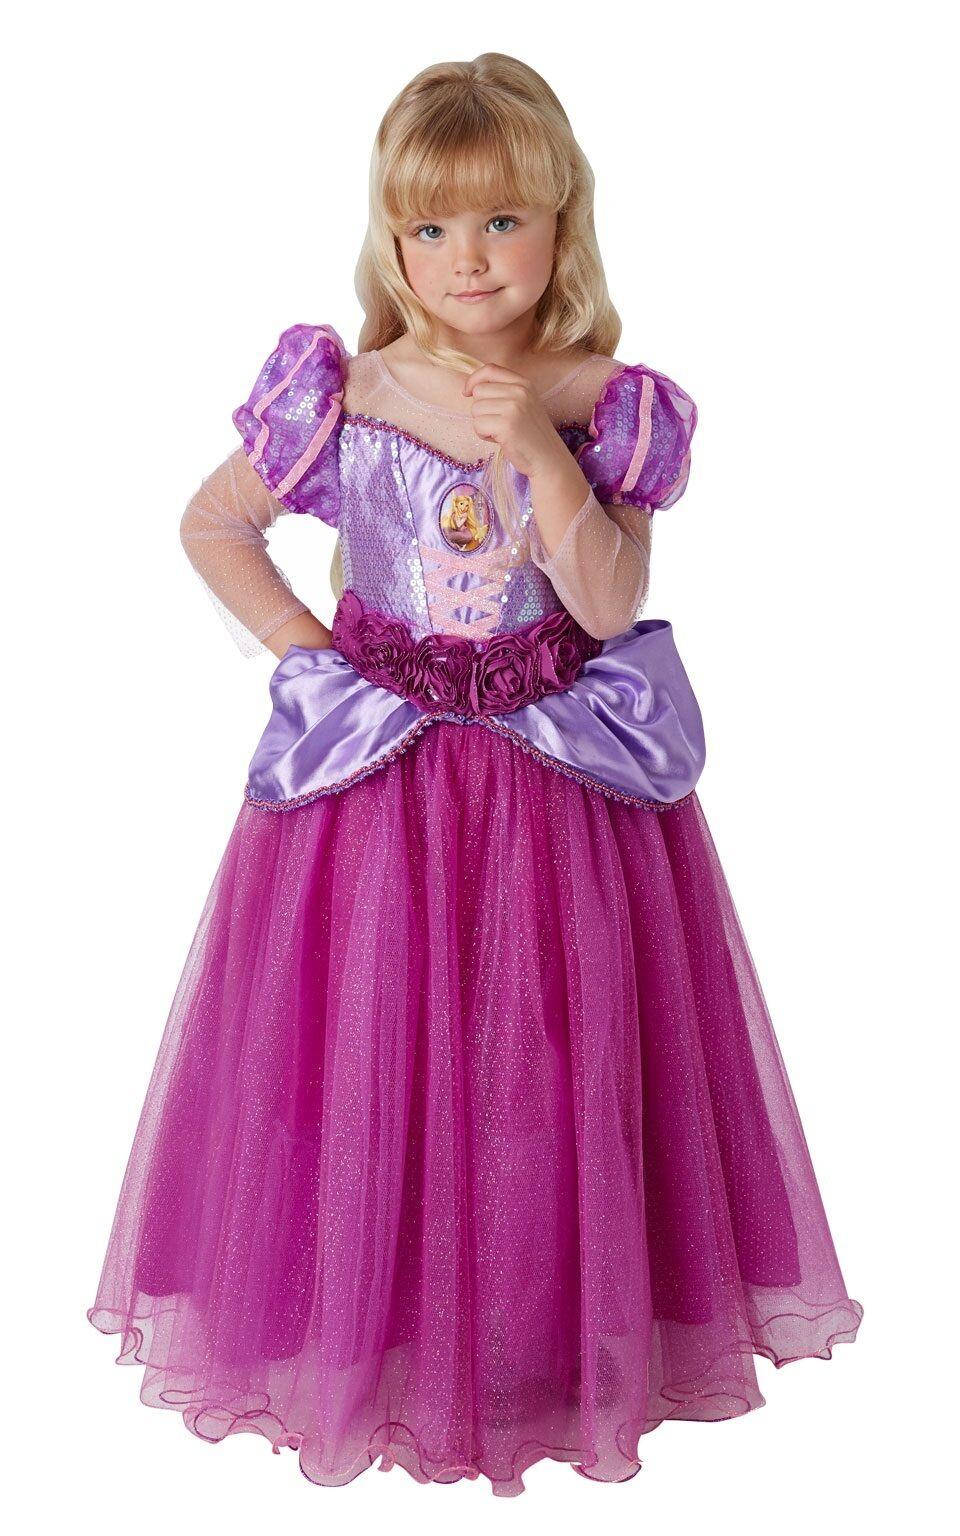 Disney Premium Princess Range  Rapunzel Tangled Full Gown Dress Costume SALE